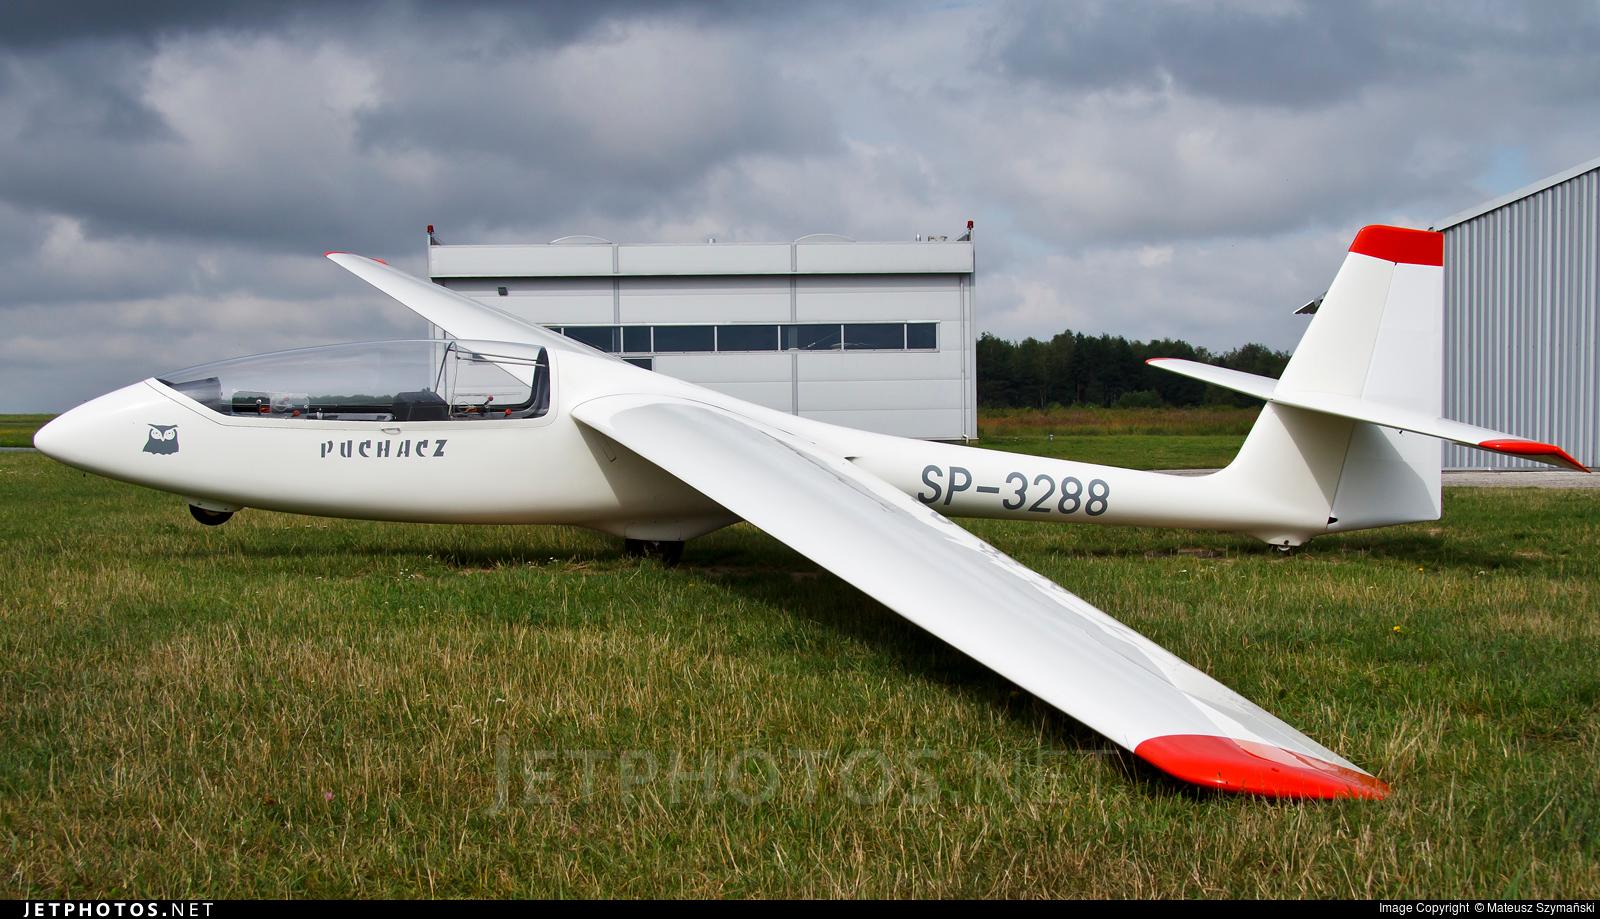 SP-3288 - SZD 50-3 Puchacz - Private